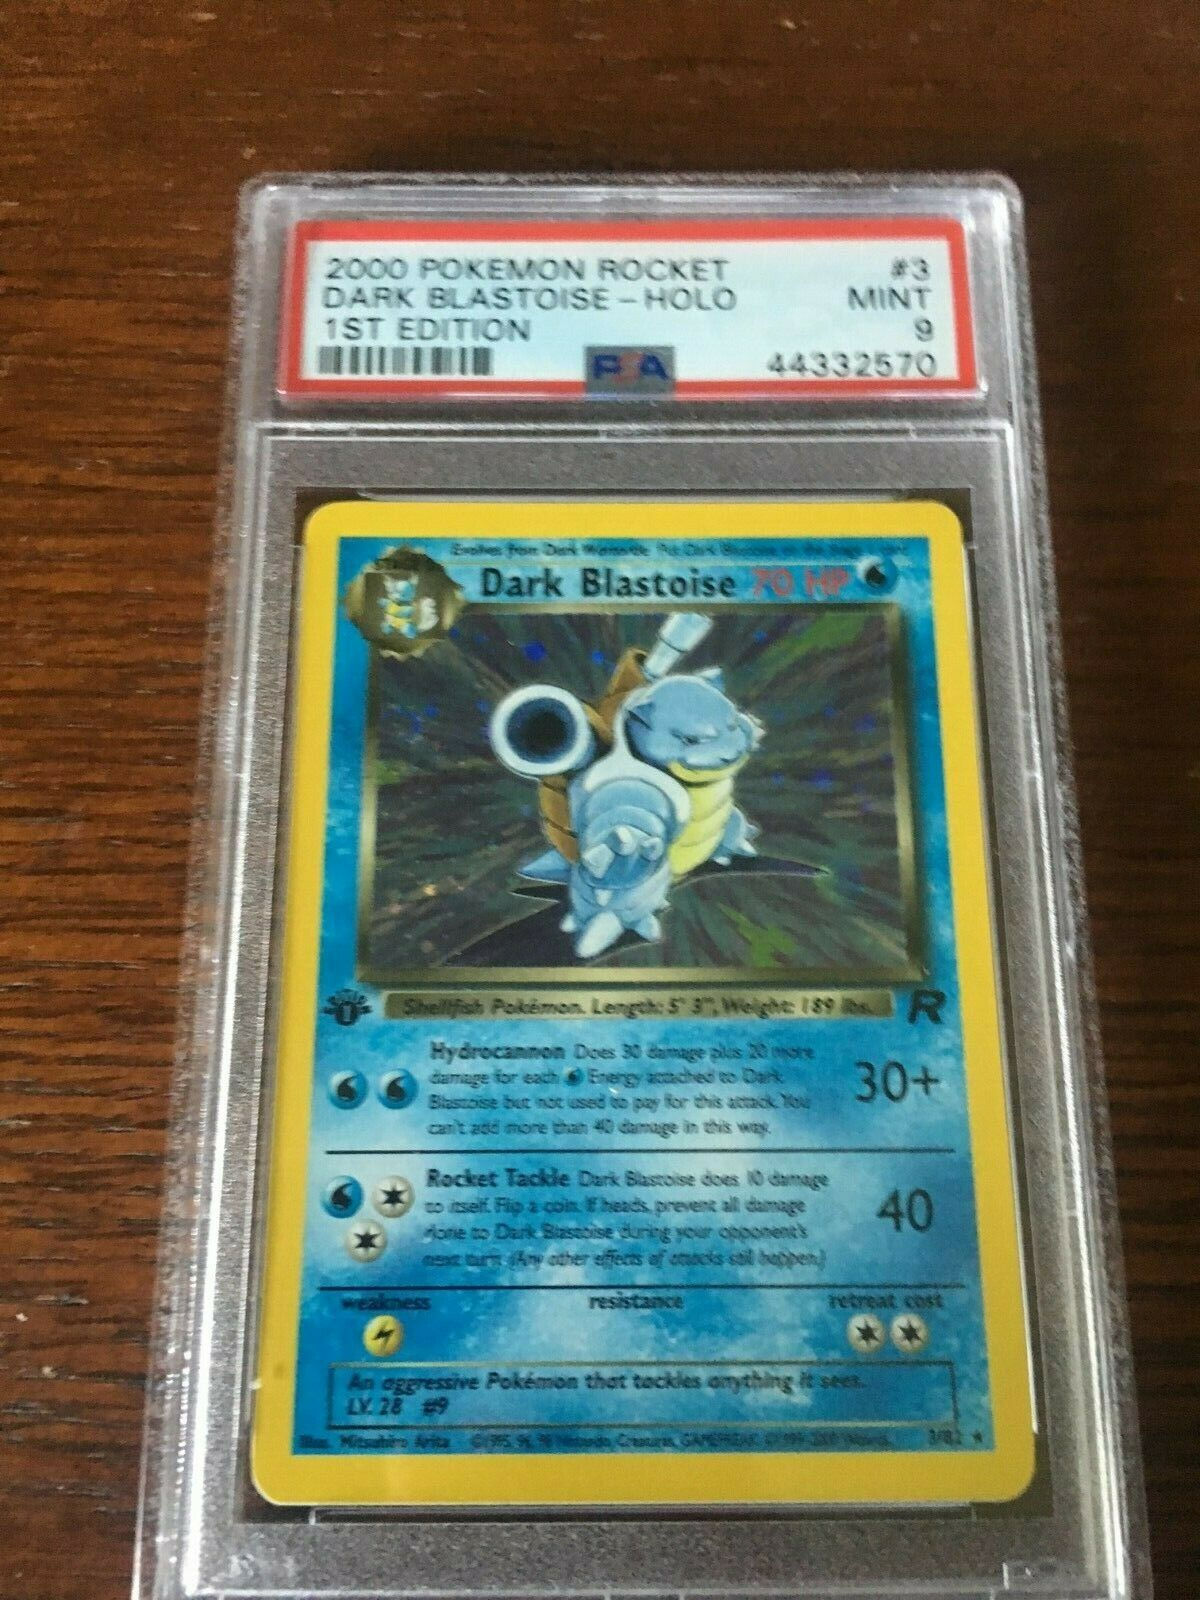 Team Rocket 1st Edition Dark Blastoise Holo Foil PSA 9  Mint Pokemon Card 382